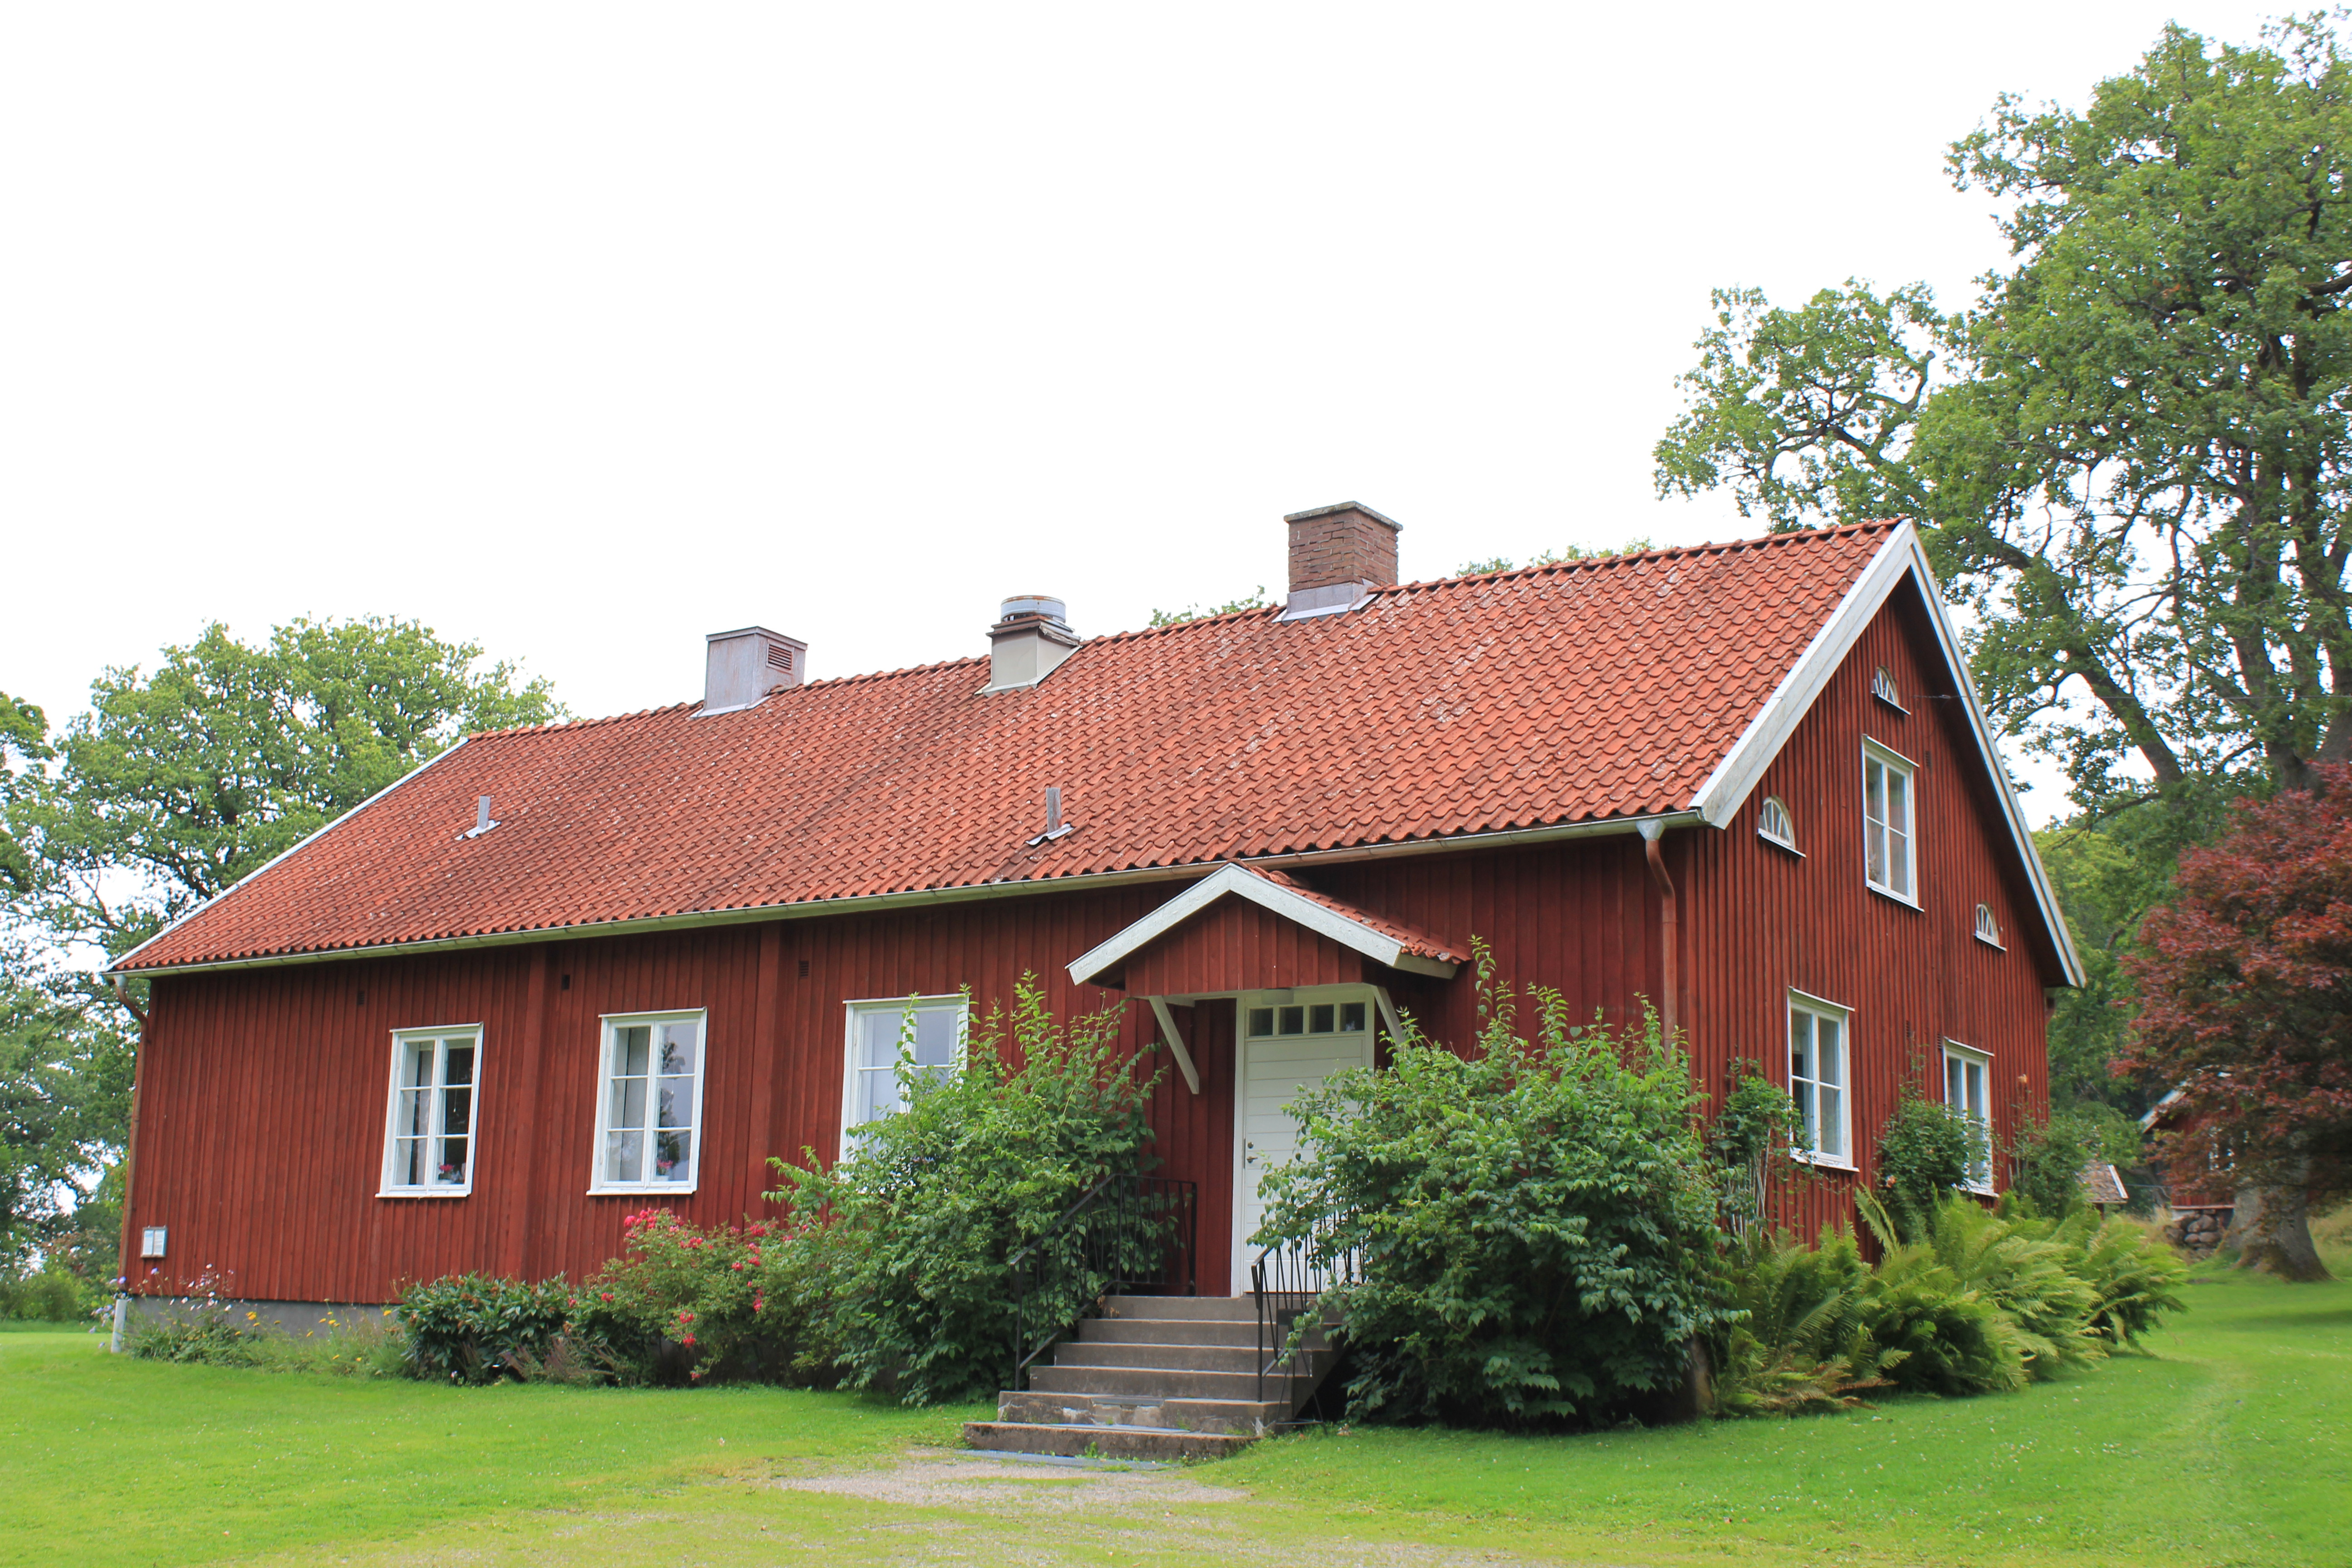 Strålande File:Stue malt i Falu Rödfärg.JPG - Wikimedia Commons YG-08